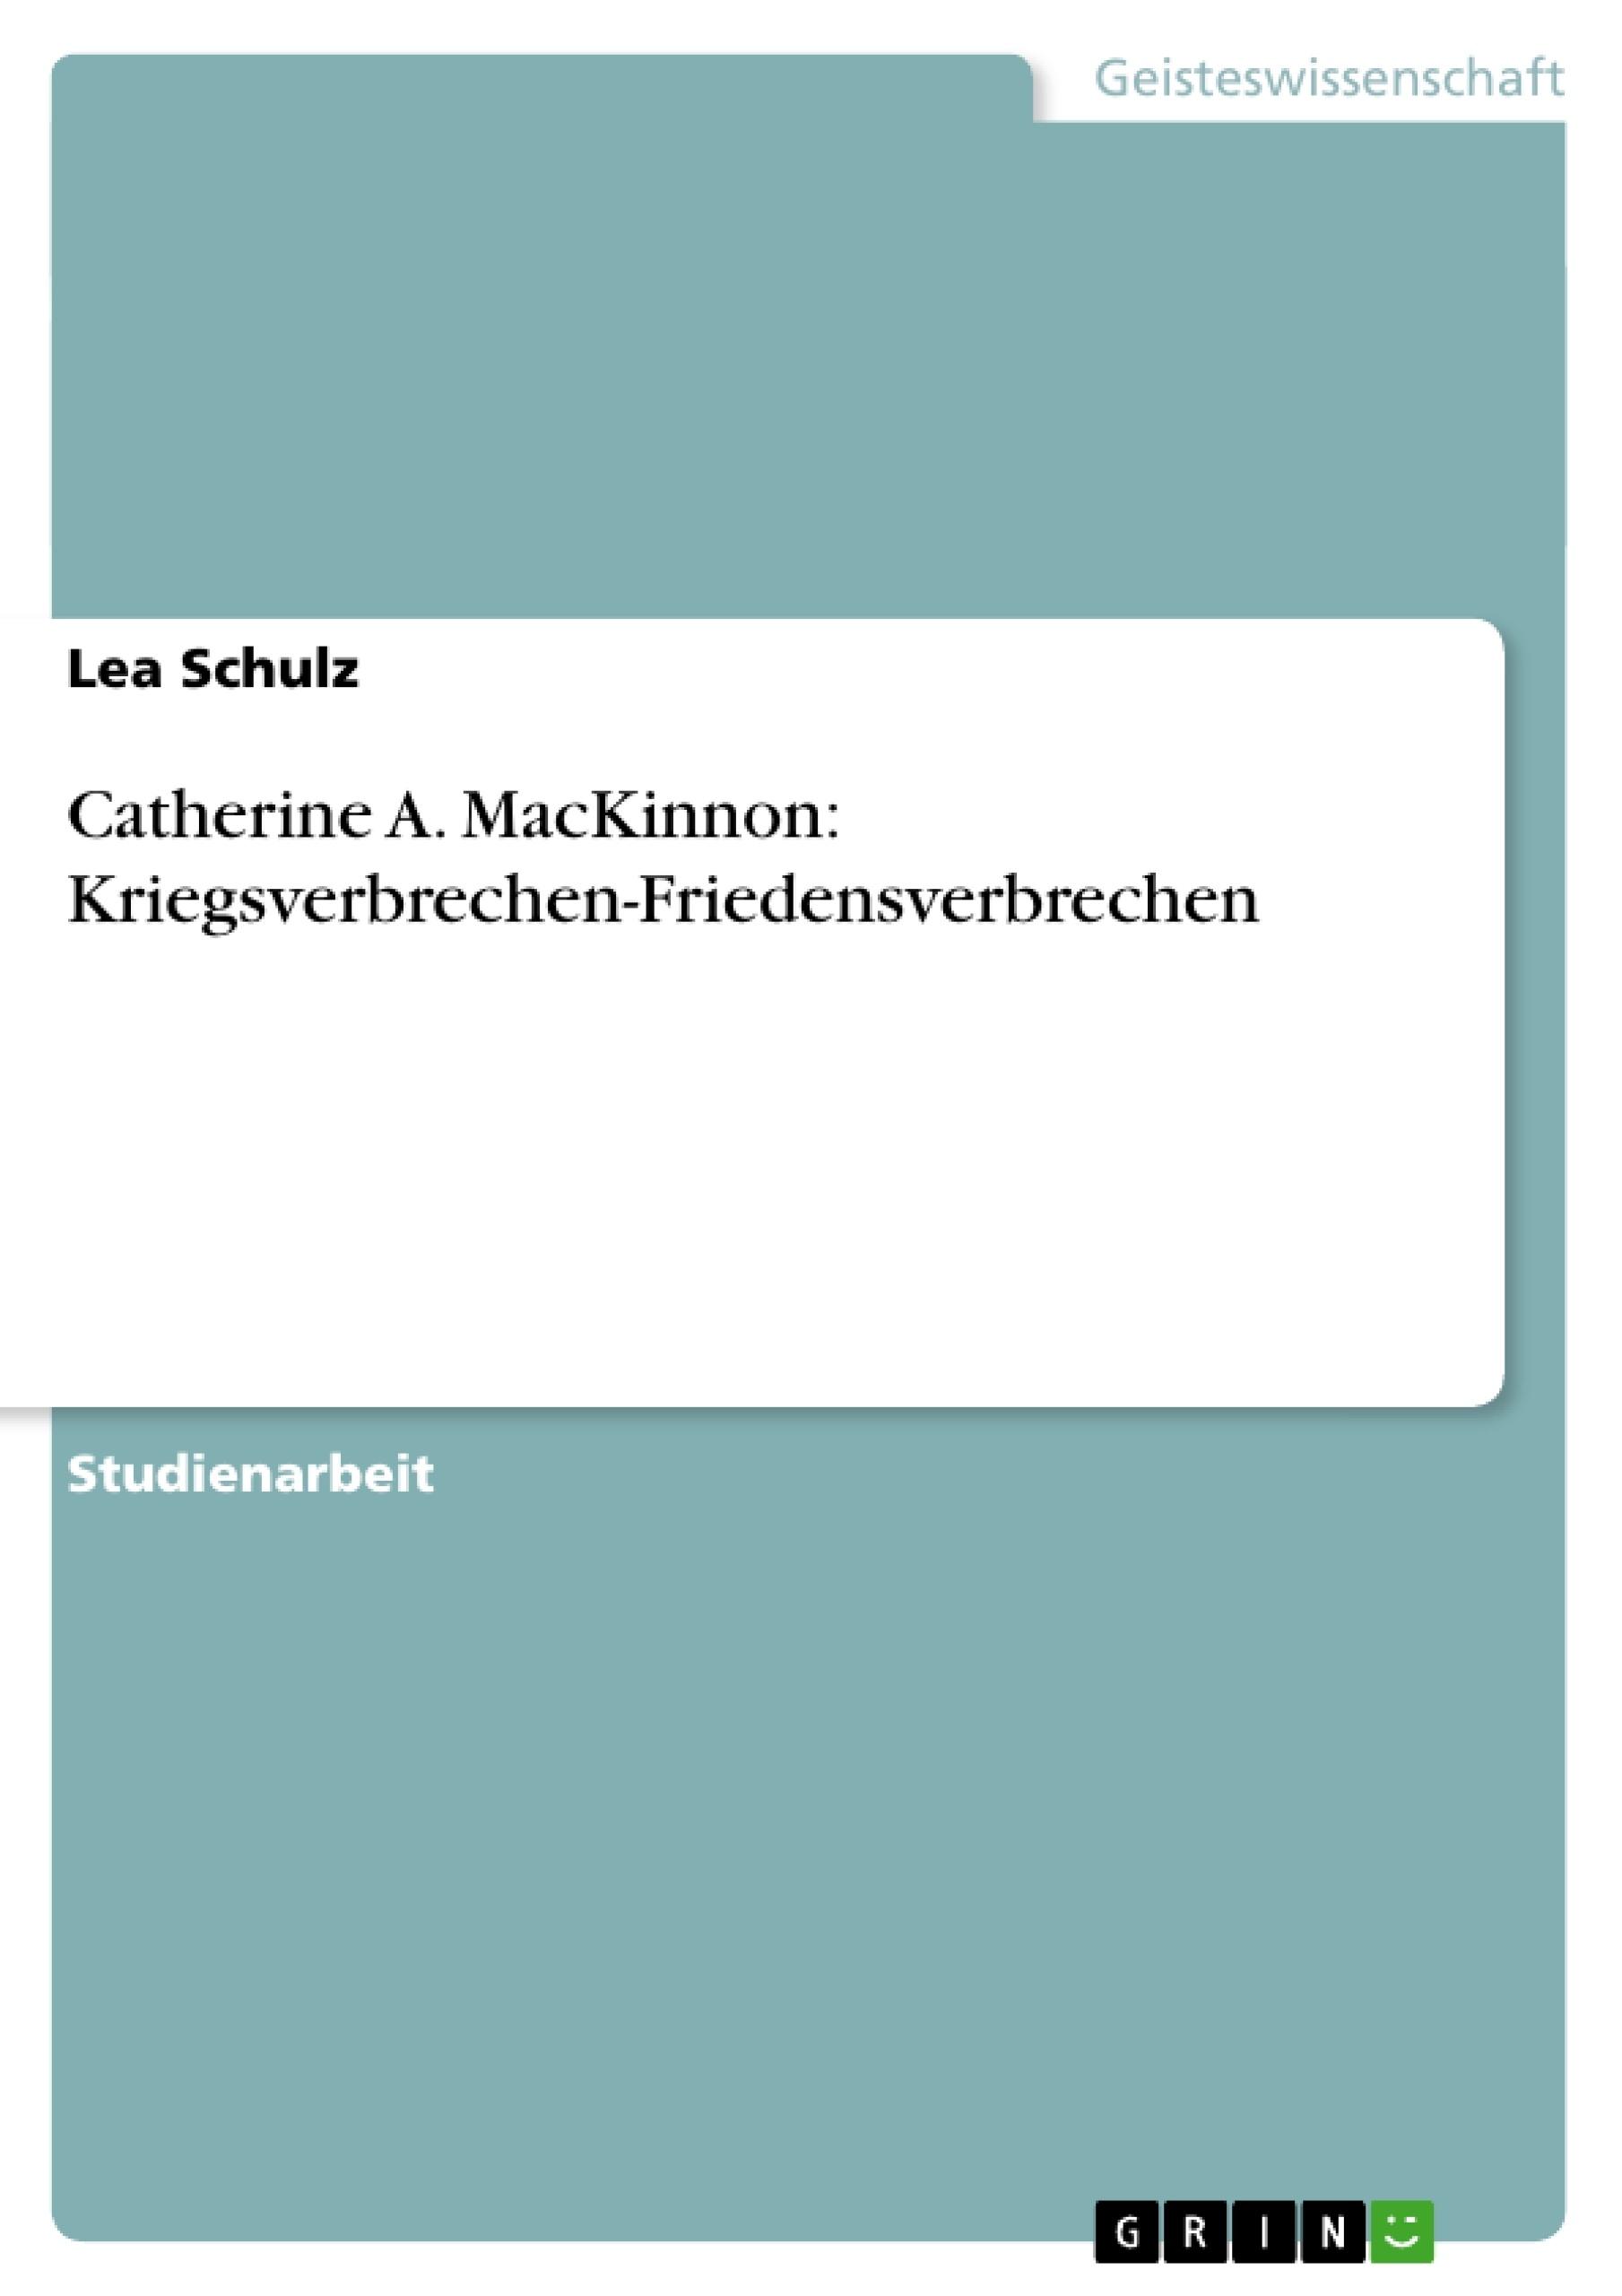 Titel: Catherine A. MacKinnon: Kriegsverbrechen-Friedensverbrechen